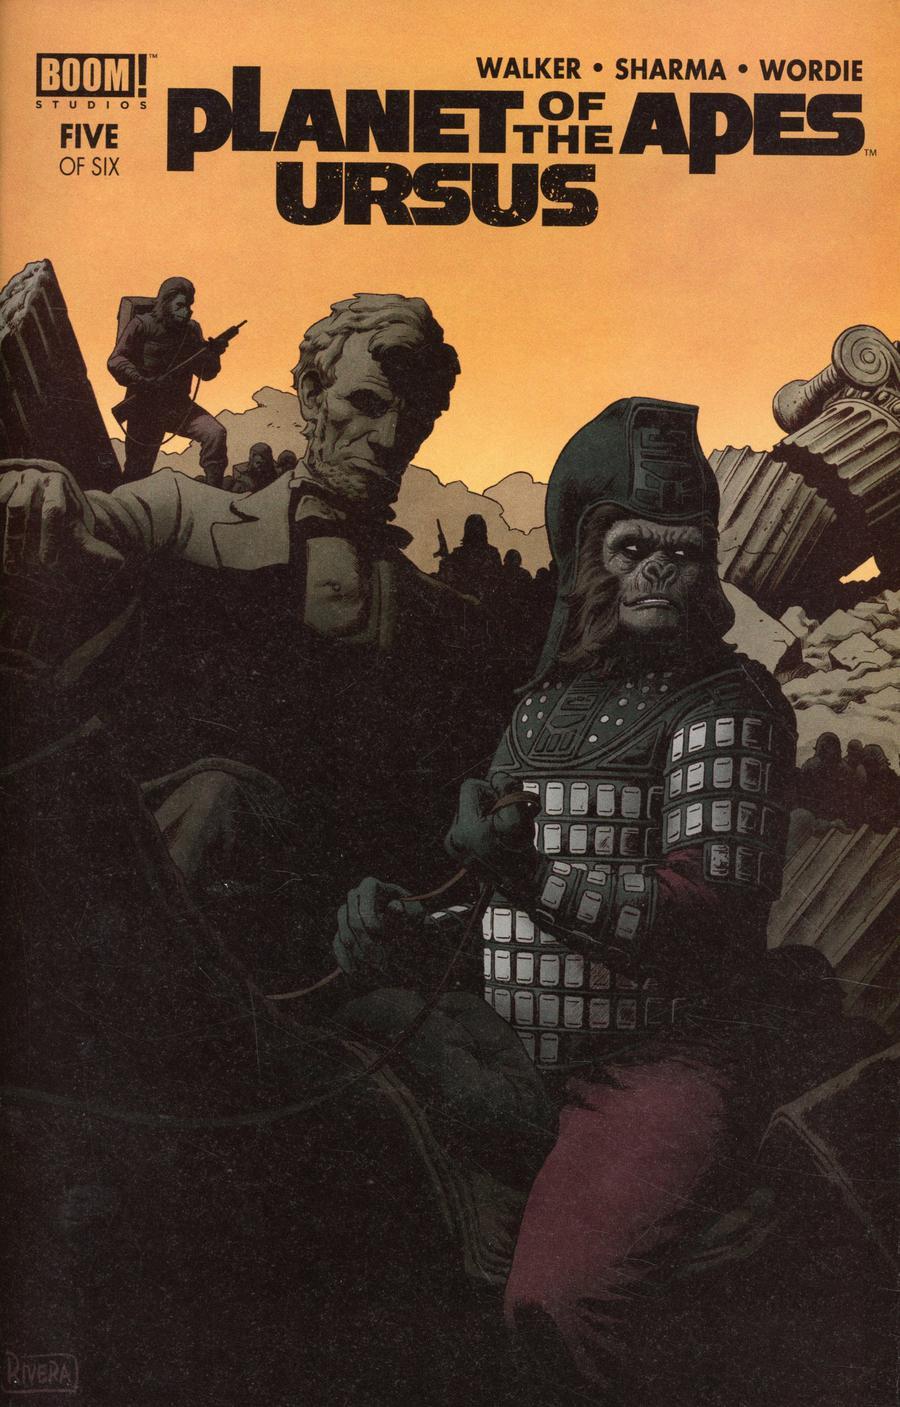 Planet Of The Apes Ursus #5 Cover A Regular Paolo Rivera & Joe Rivera Cover